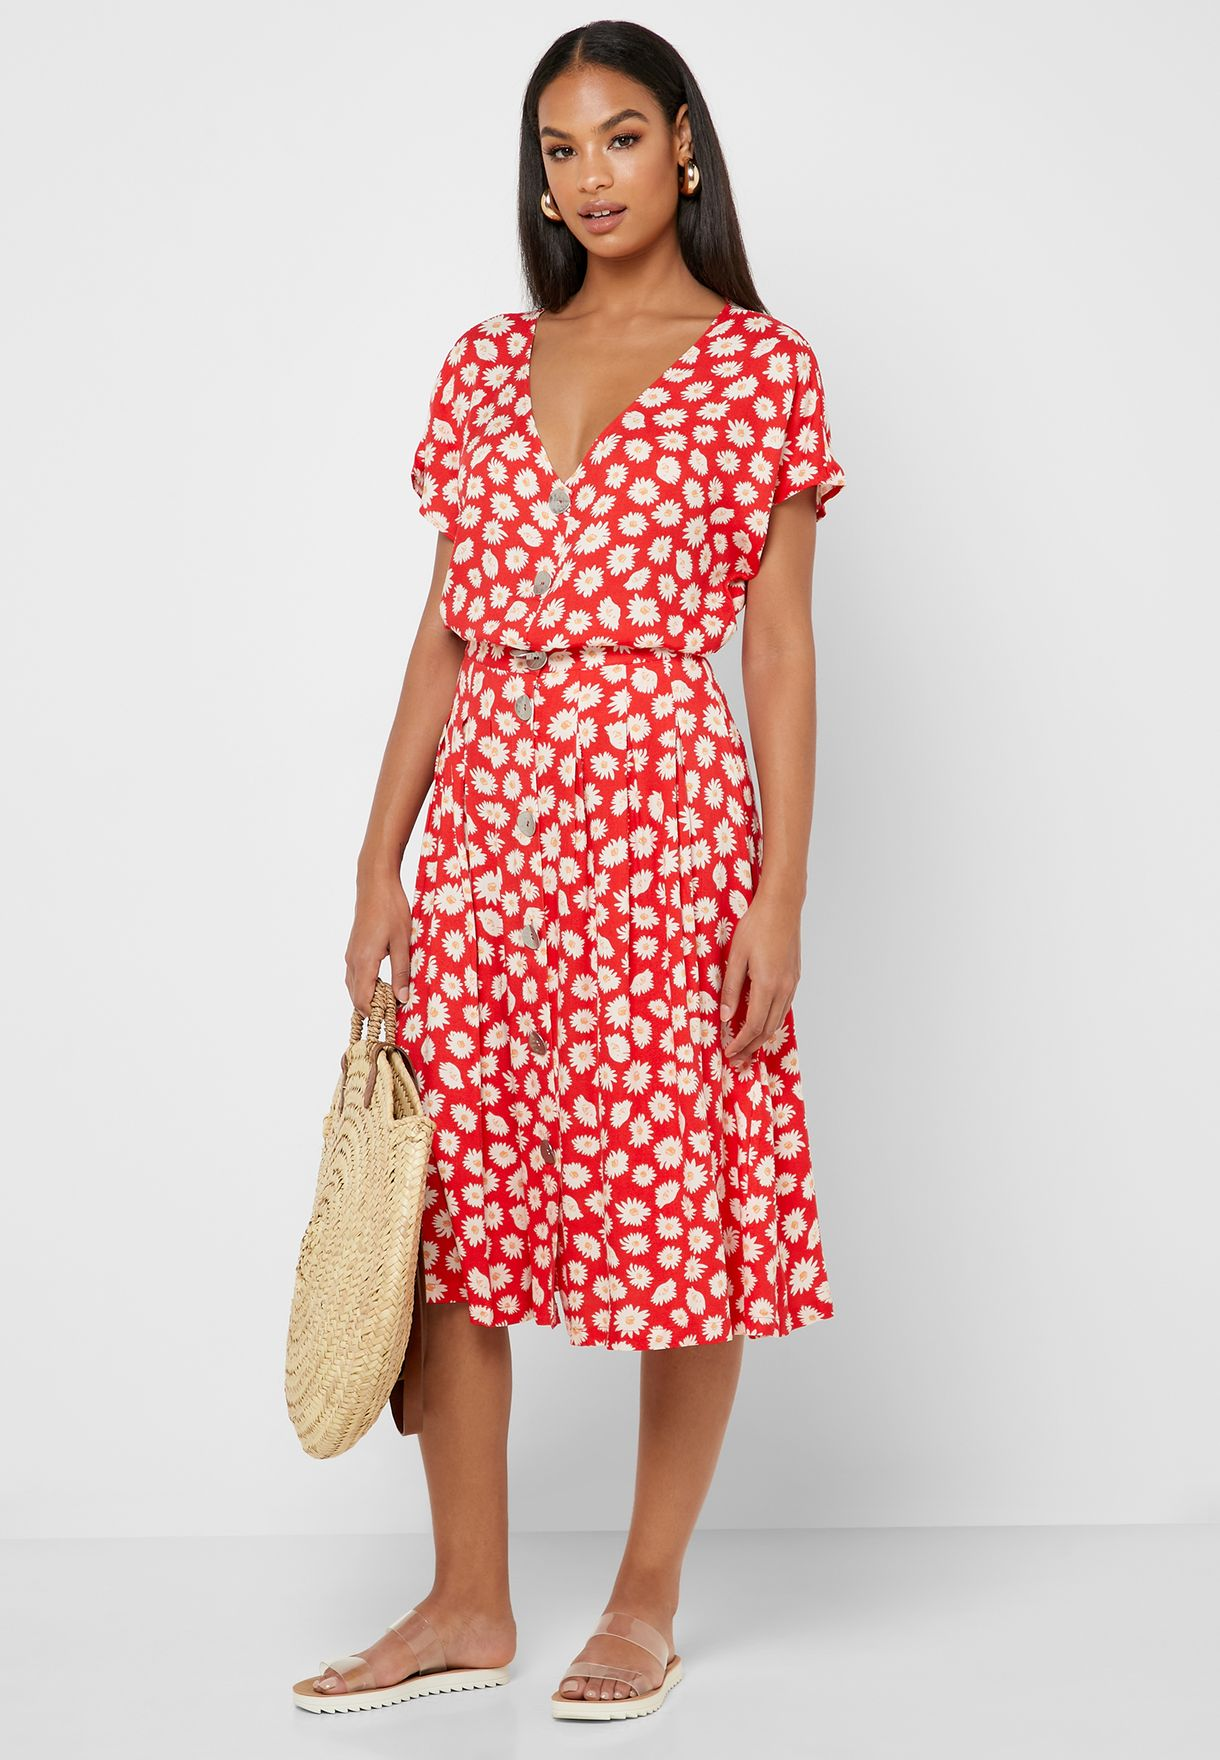 Floral Print Button Through Skirt